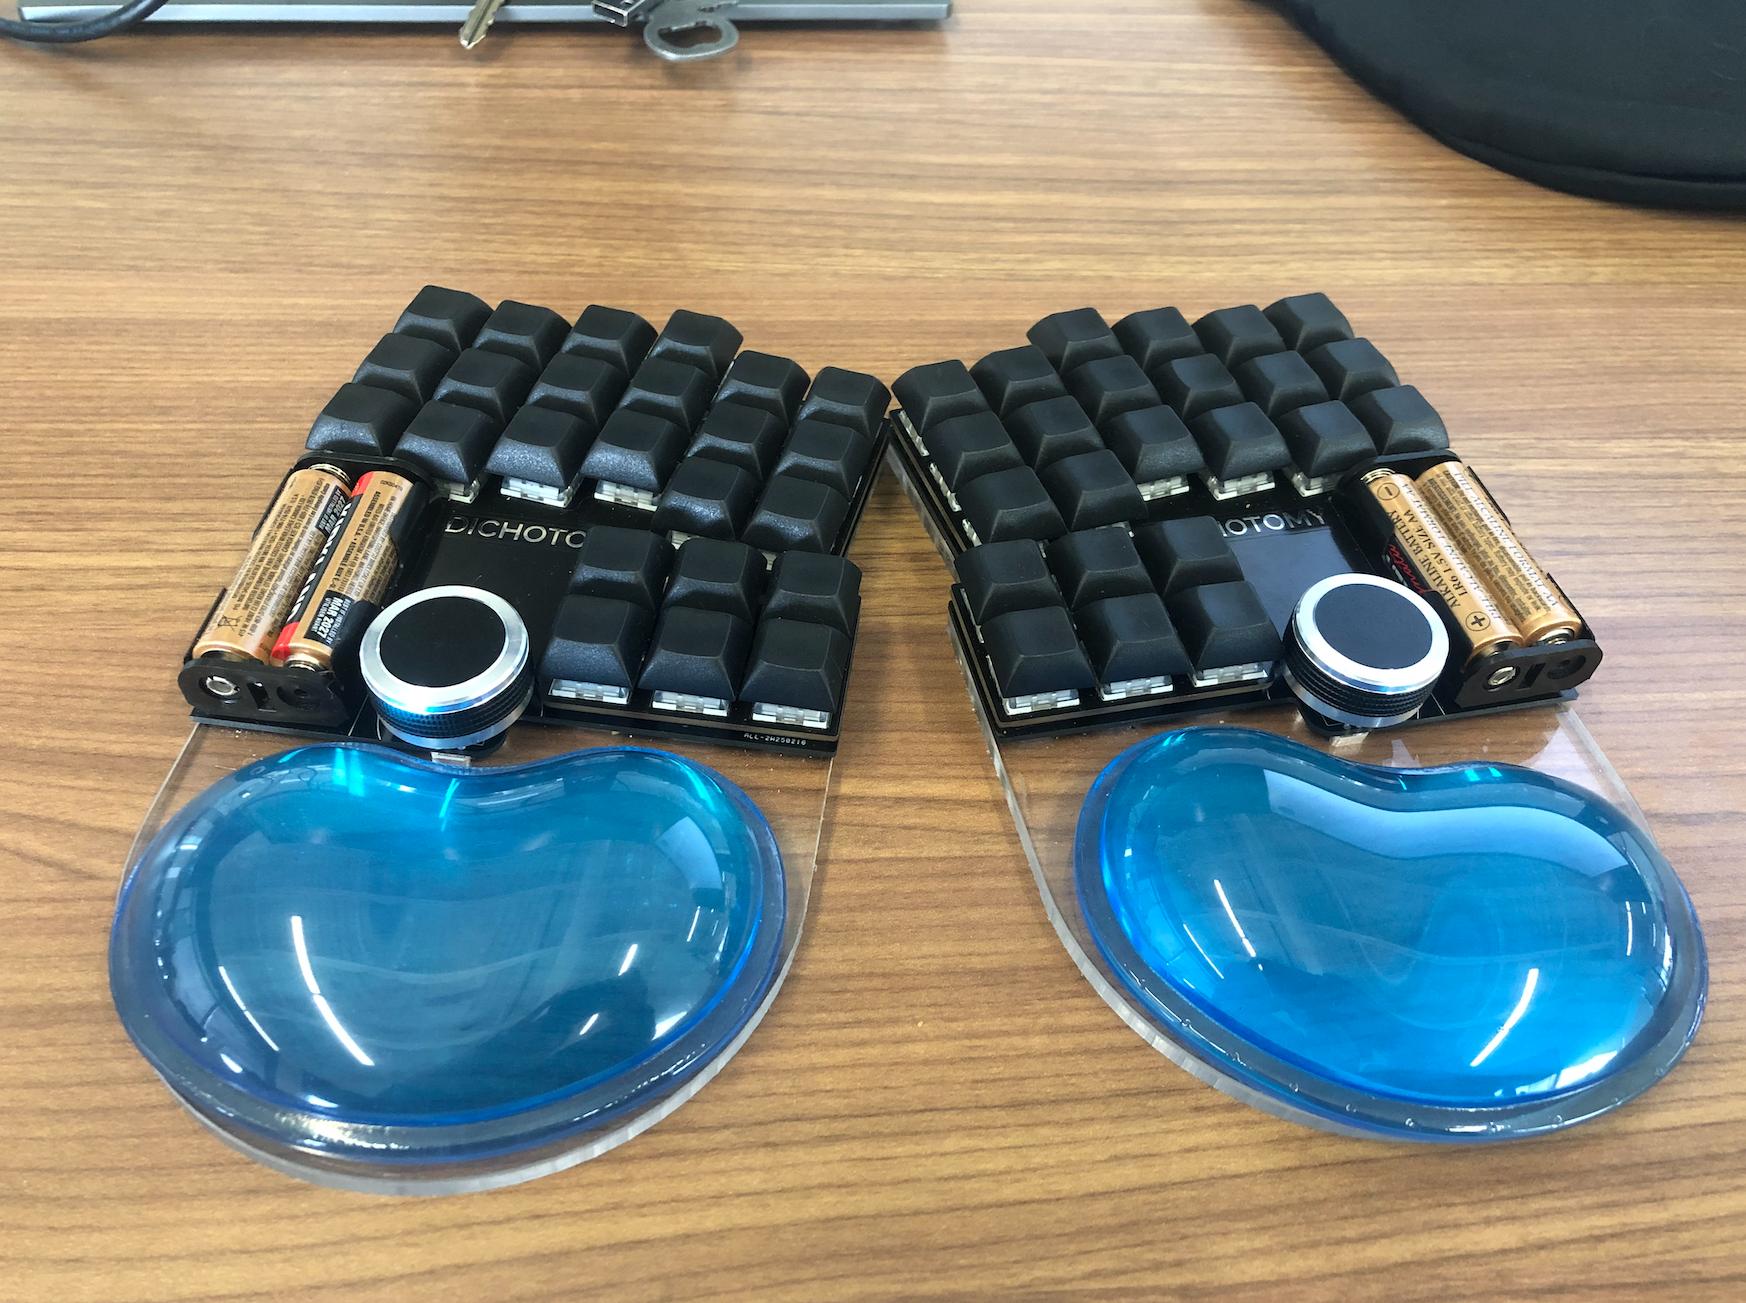 Dichotomy - Keyboard and Mouse | Hackaday io